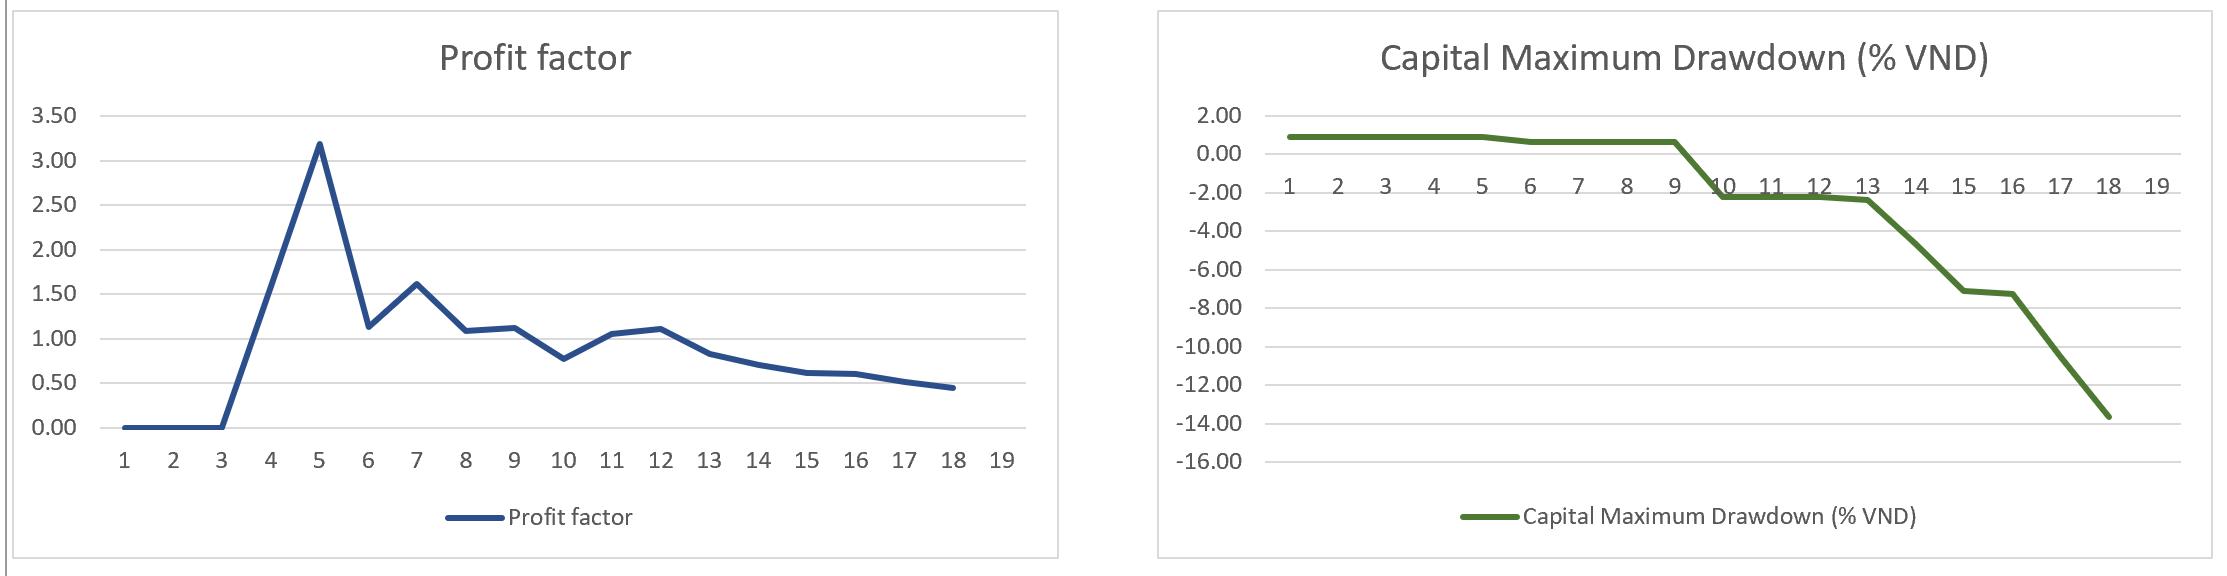 202109_VN30F1M_H1_Maximum Drawdown_Profit factor_Chart.PNG